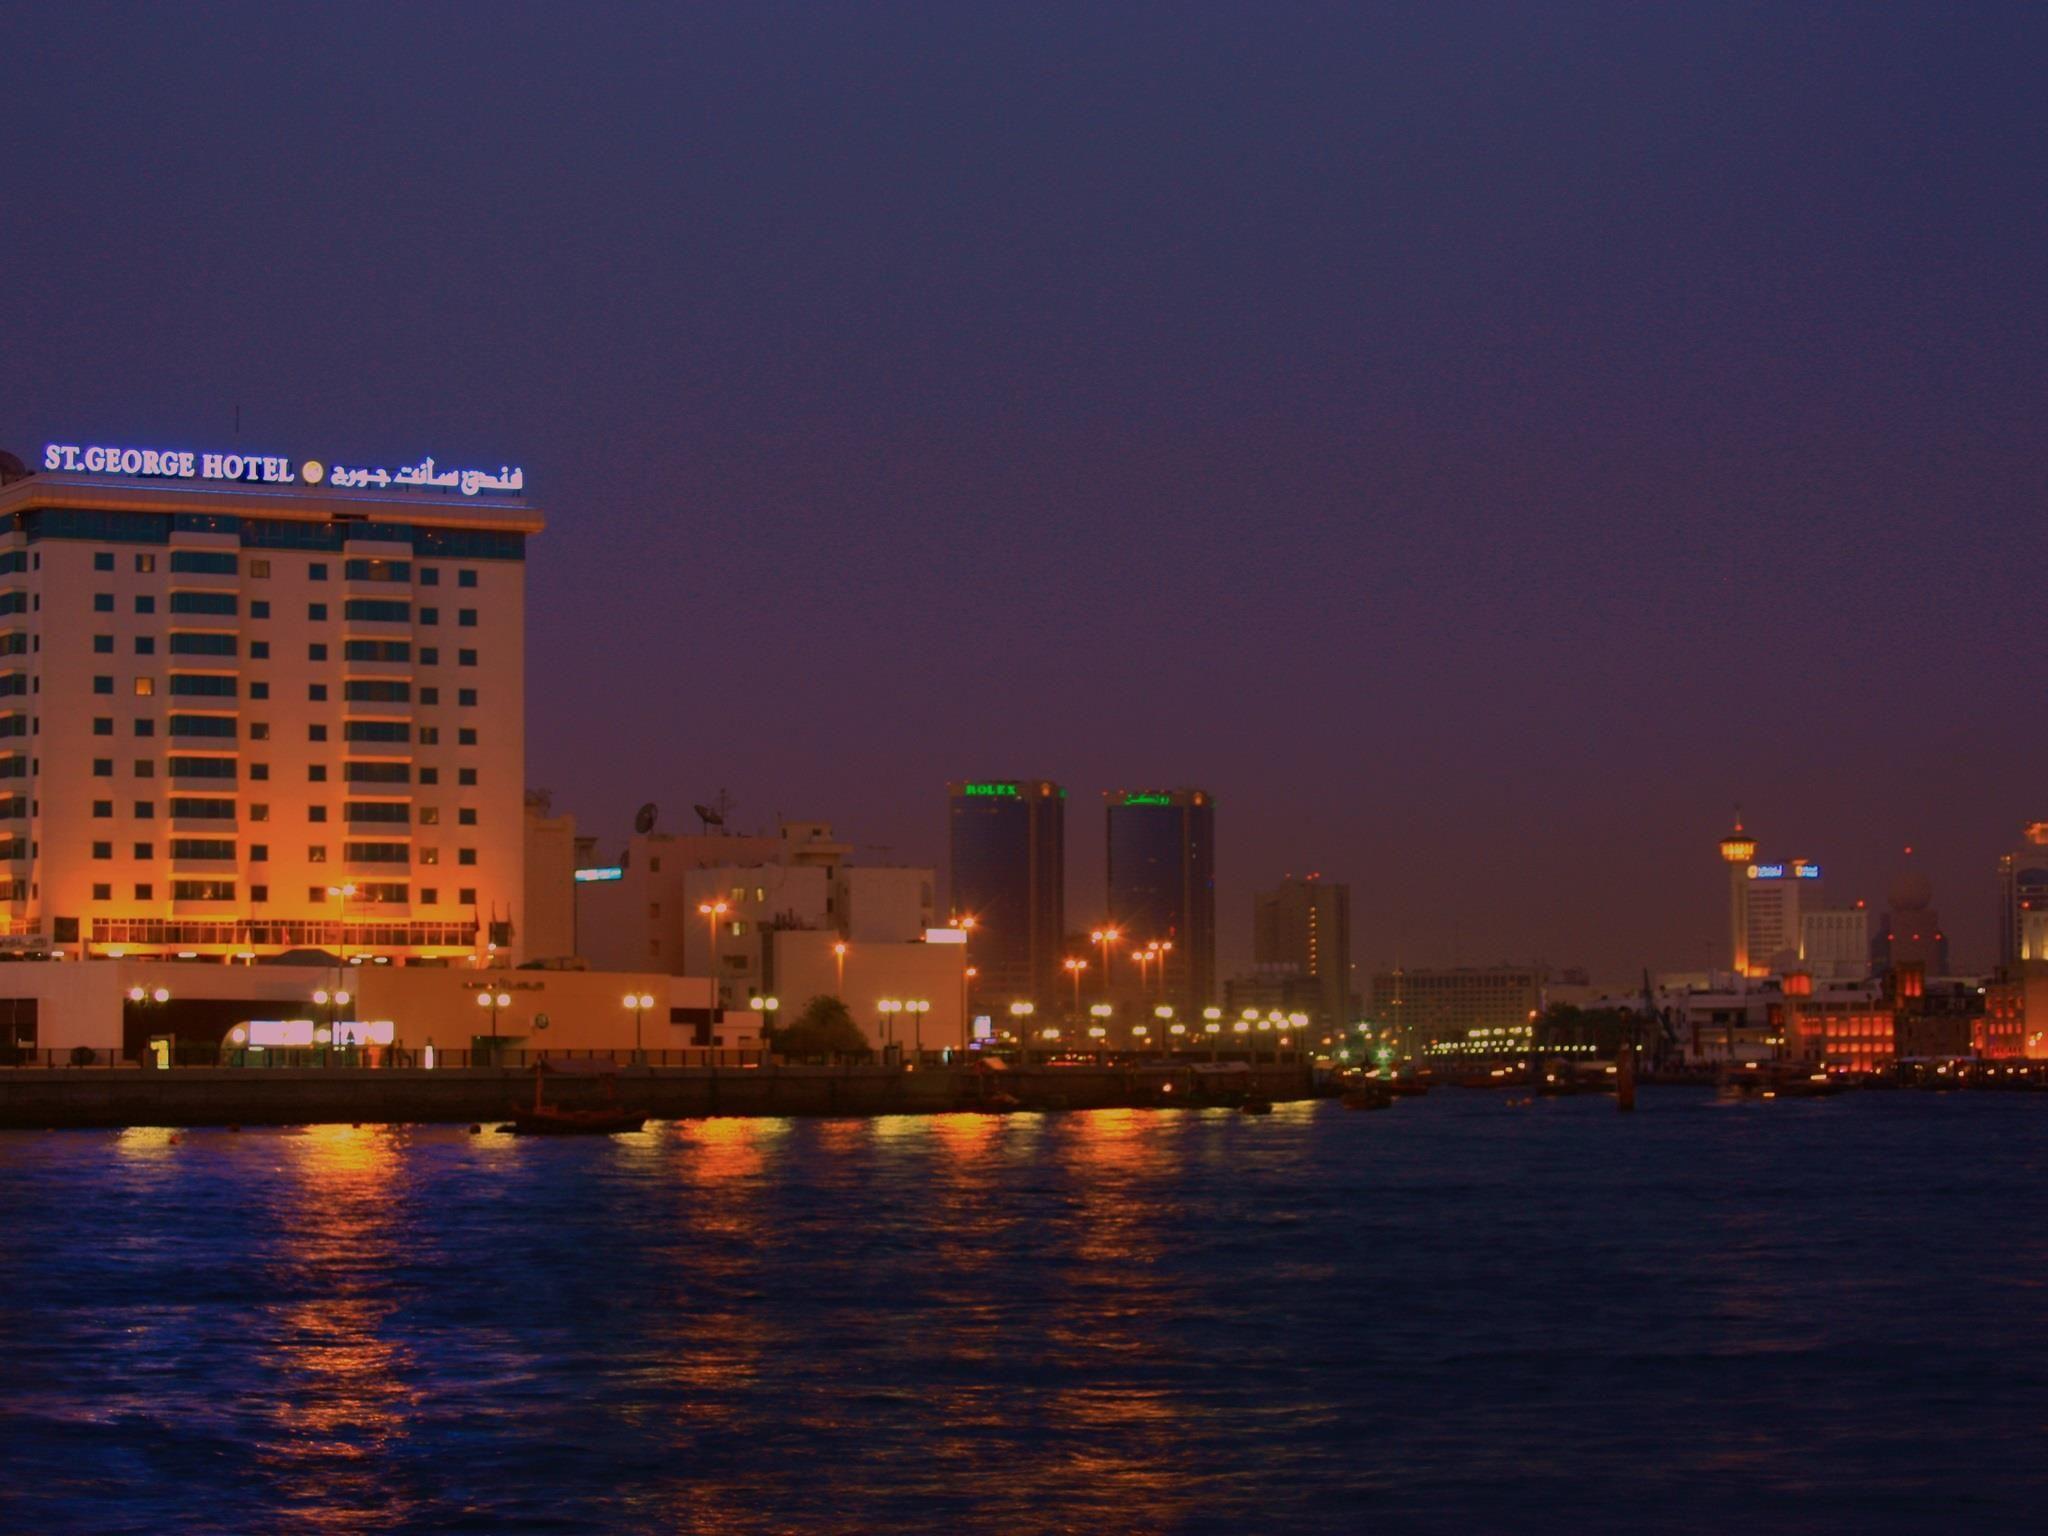 dubai st george hotel united arab emirates middle east st george rh pinterest co uk